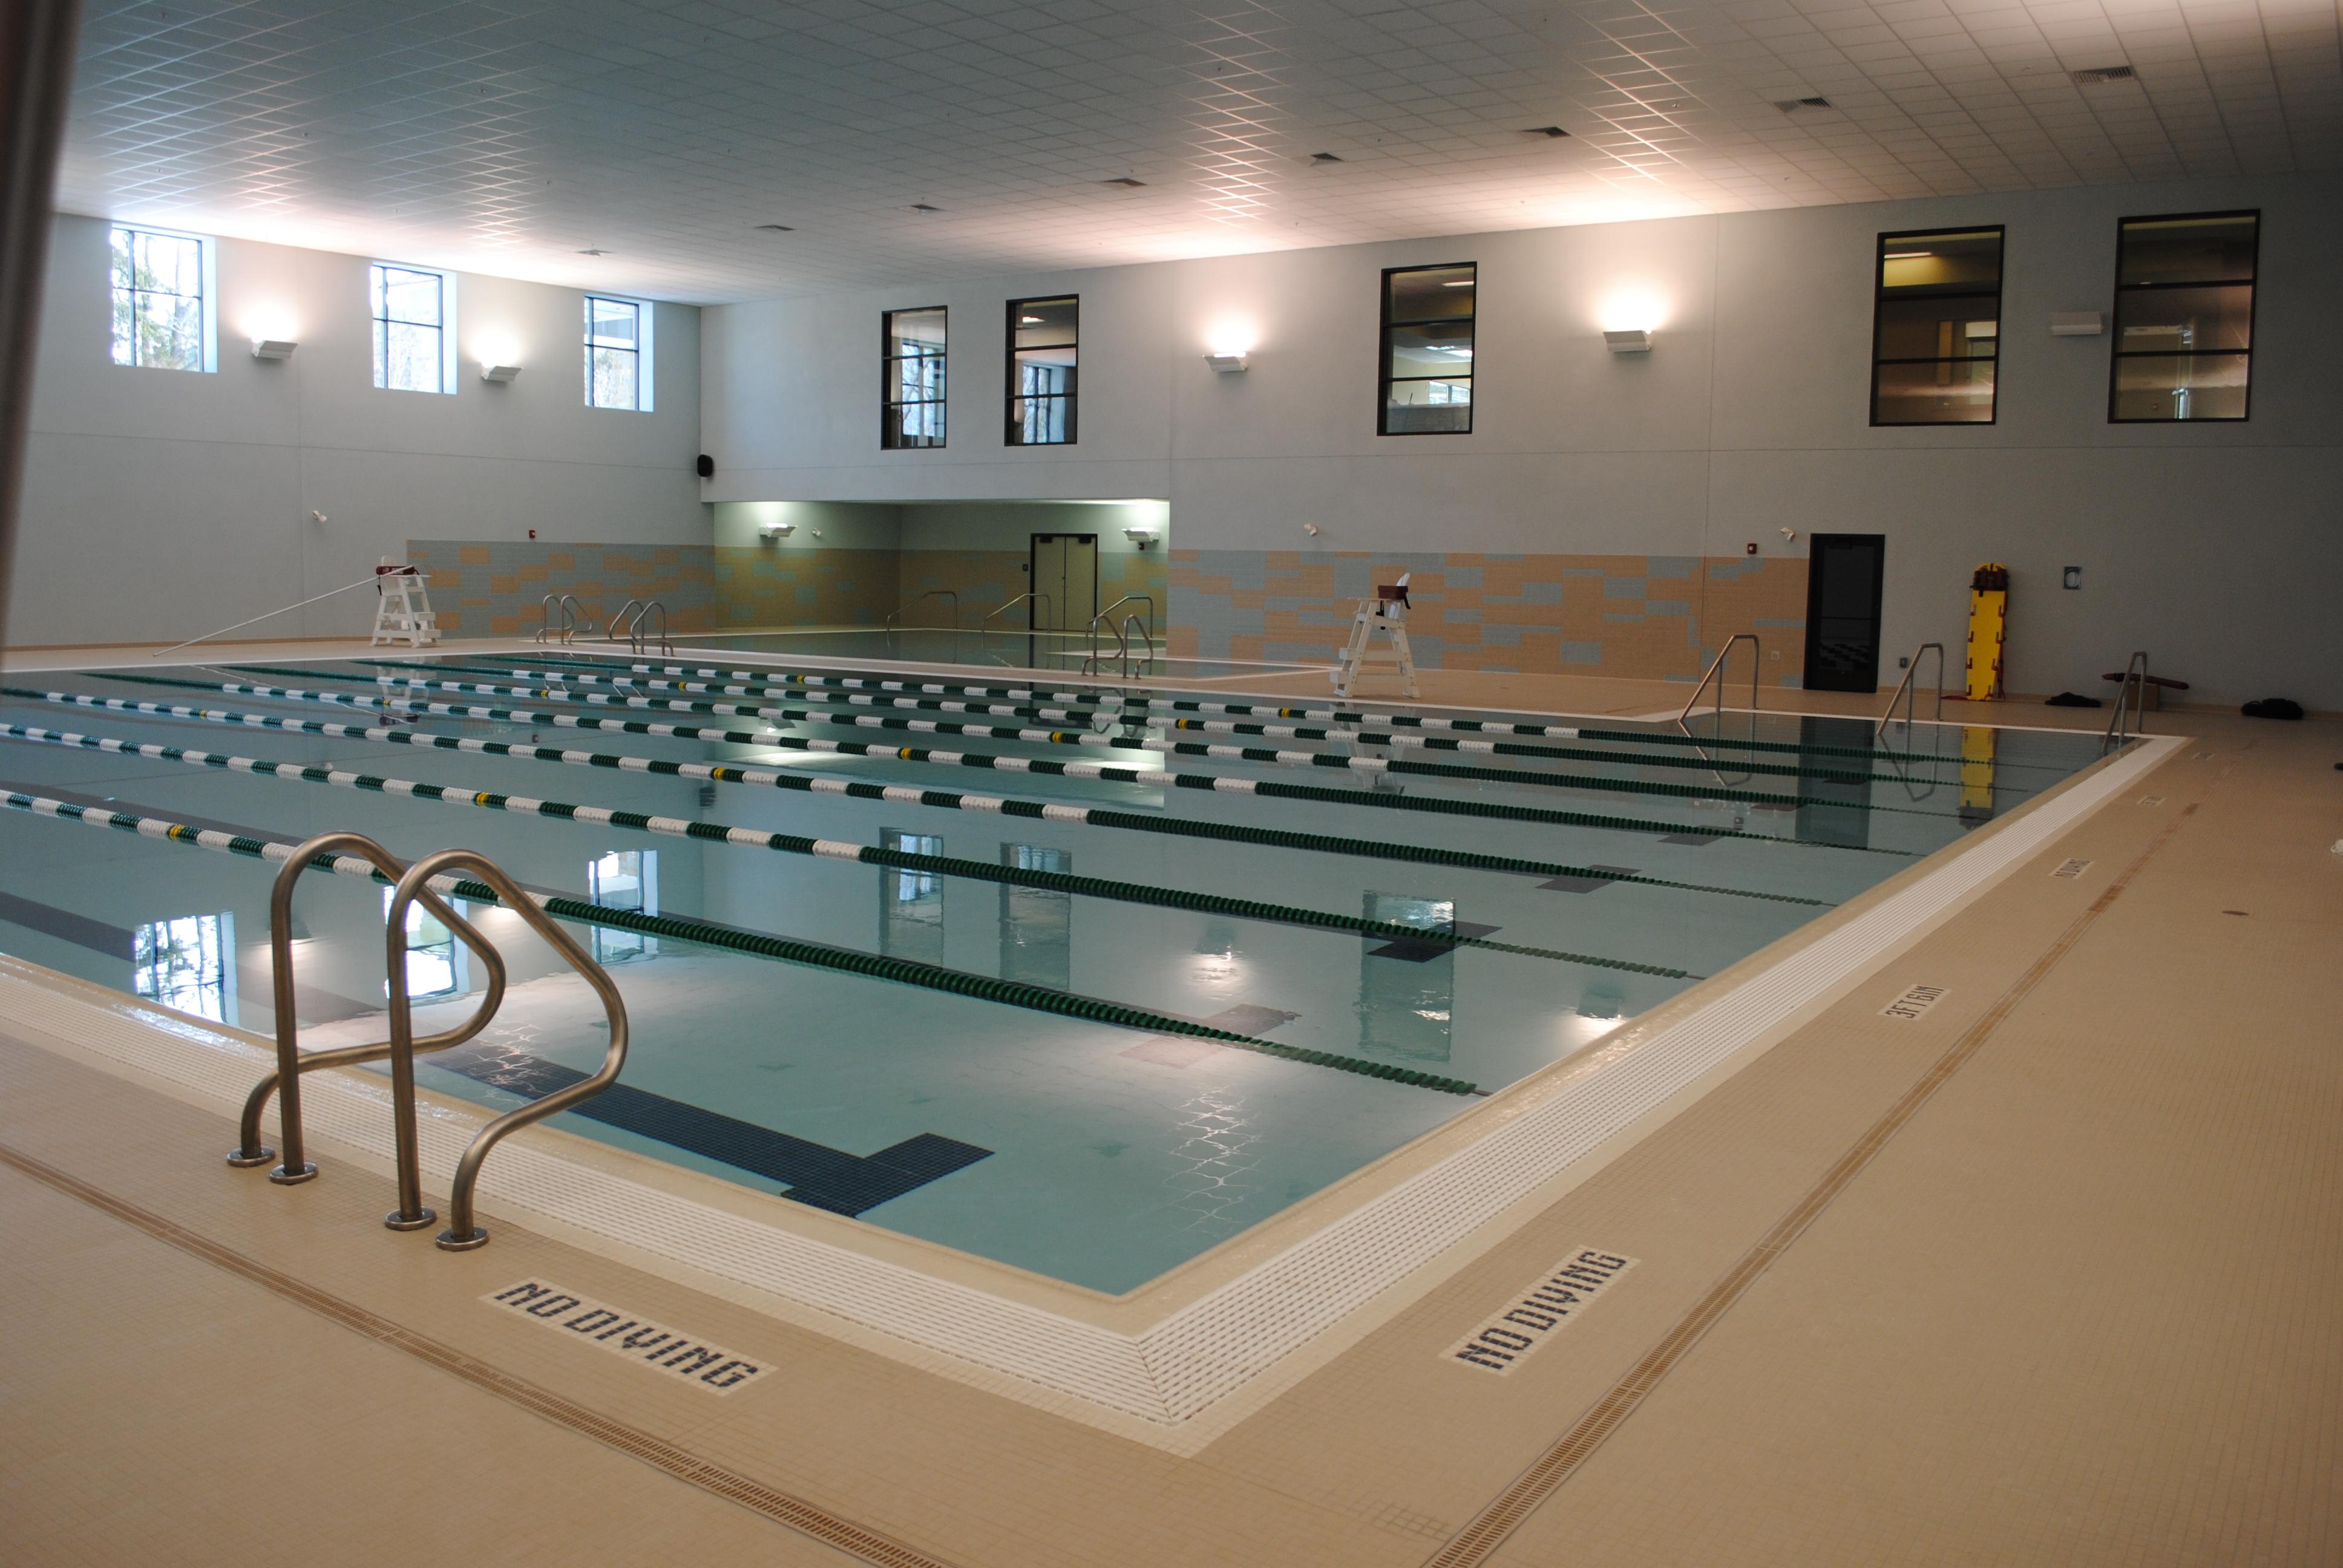 South Shore Gunite Pools Spas Inc N Billerica Massachusetts Proview